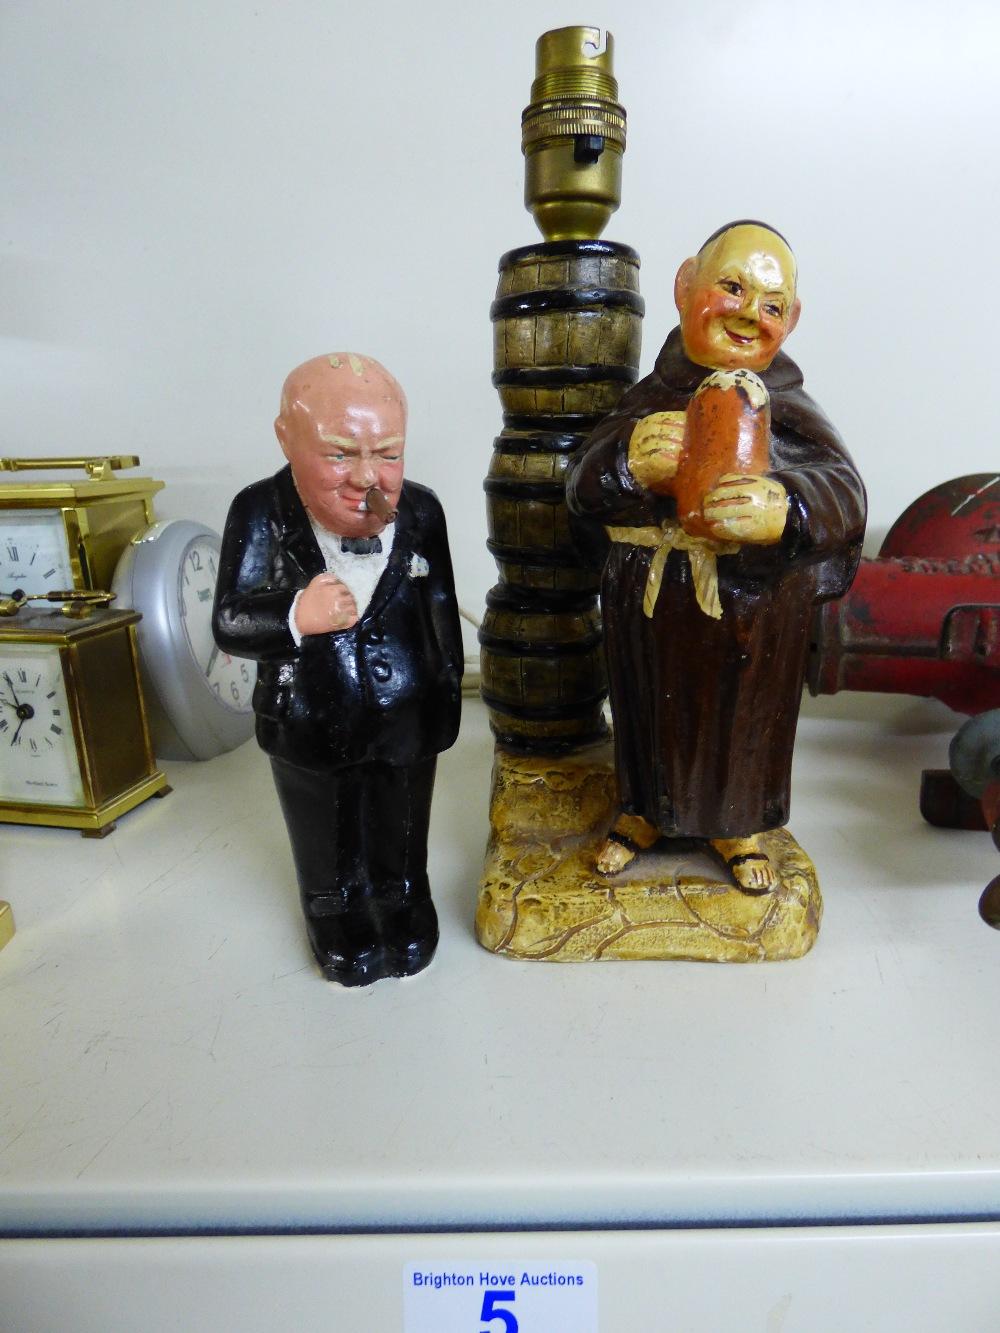 Lot 5 - WINSTON CHURCHILL CHALK FIGURE & MONK FIGURE LAMP BASE